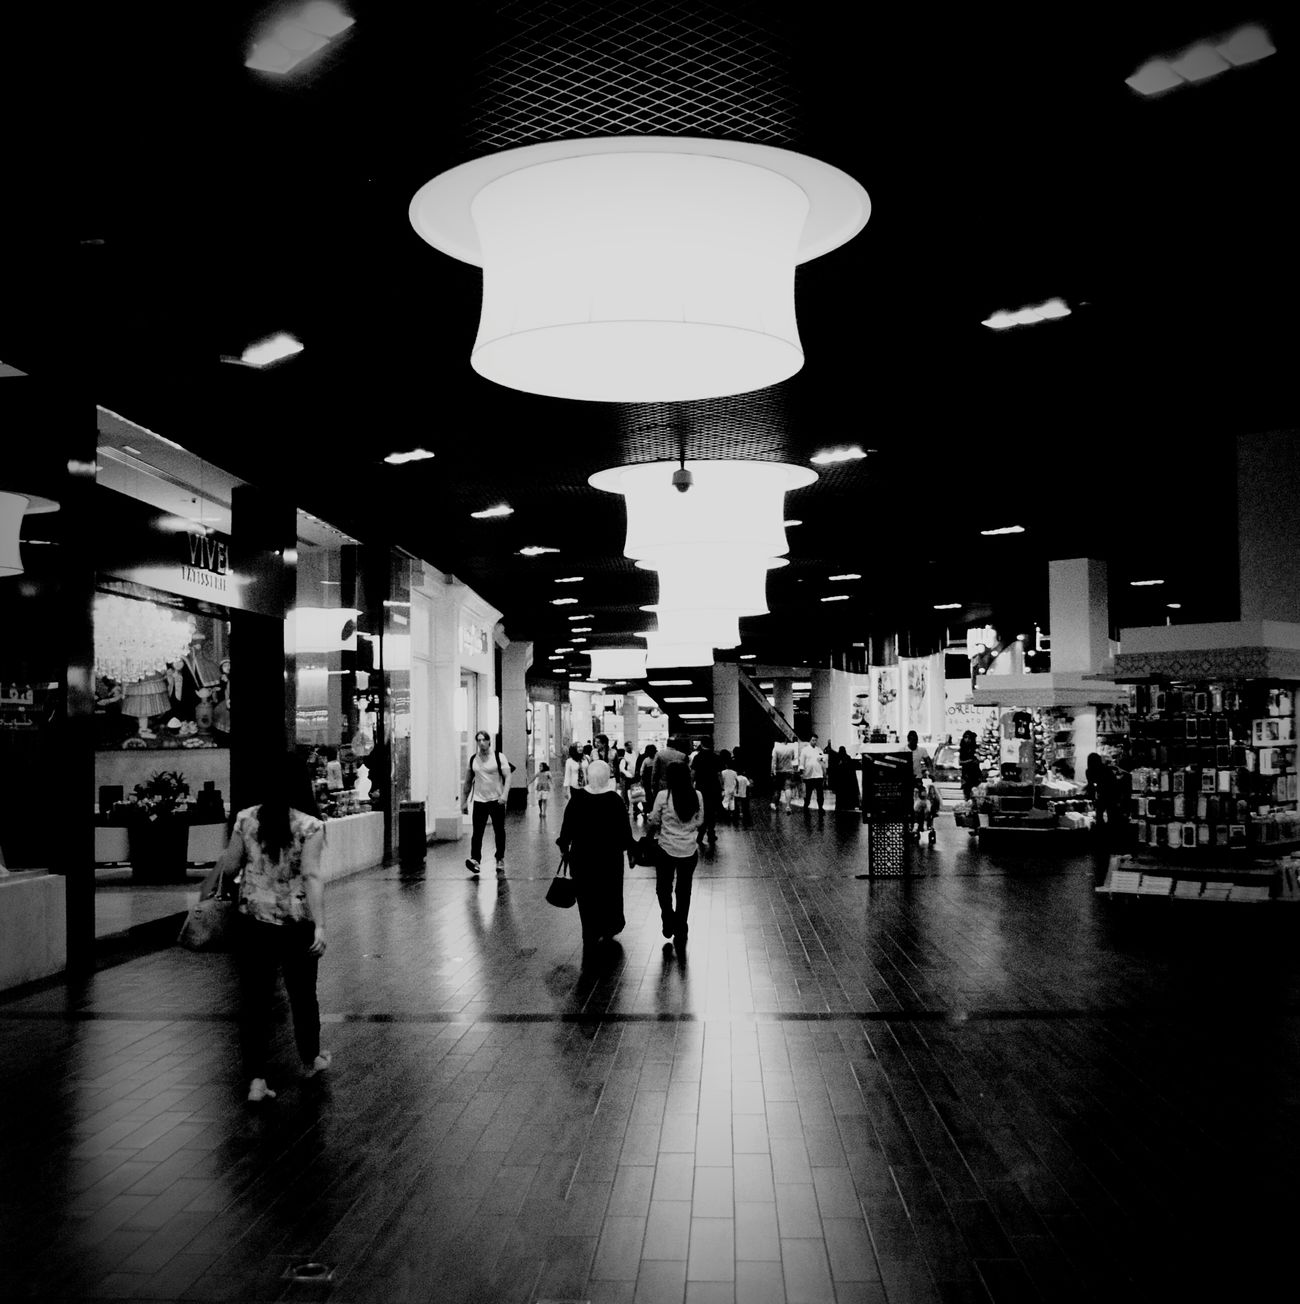 Dubai Mall @ UAE . Dubai❤ Theburjkhalifa UAE , Dubai